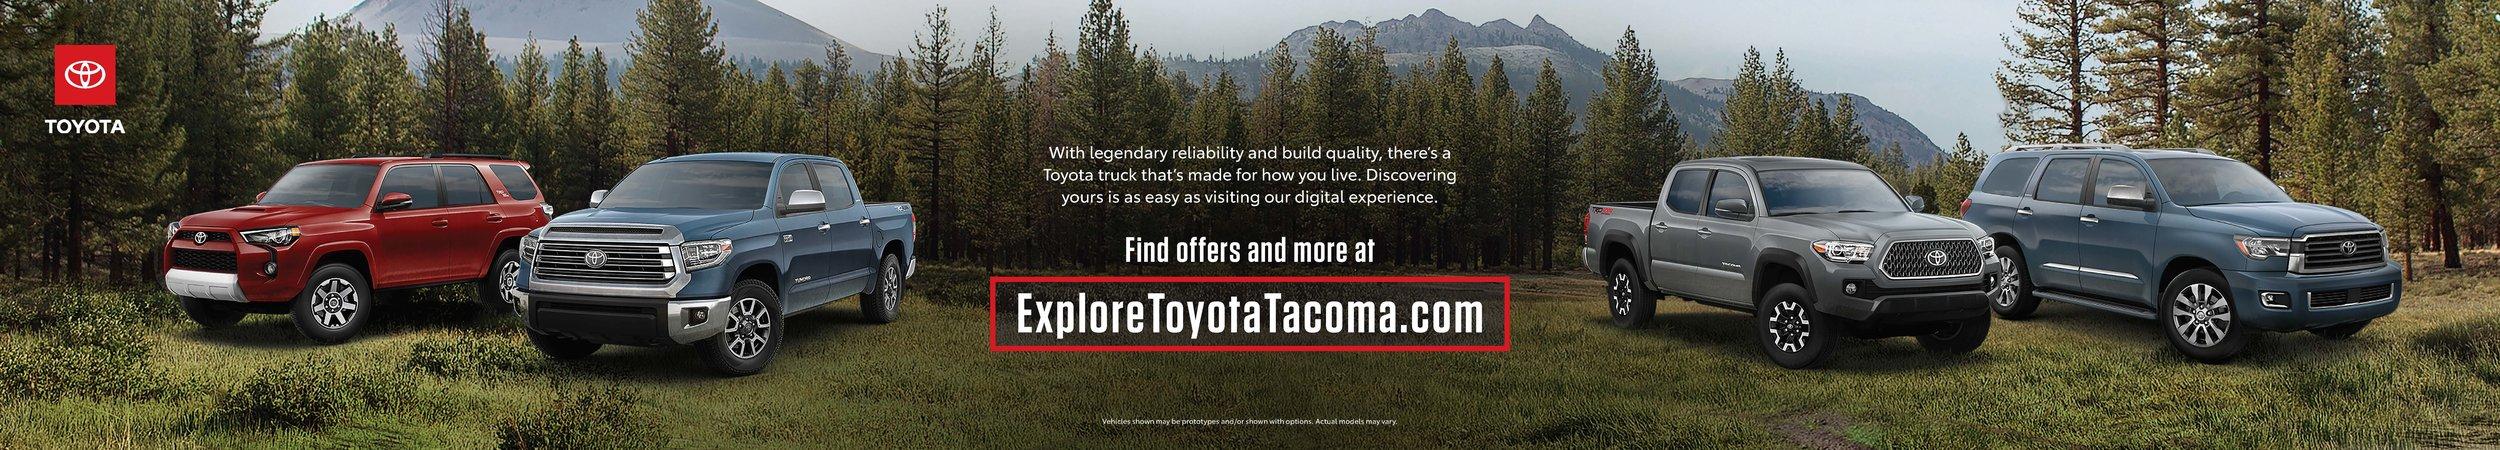 075133_TrucksExperience_TACOMA_DM_5x7_Page_2.jpg